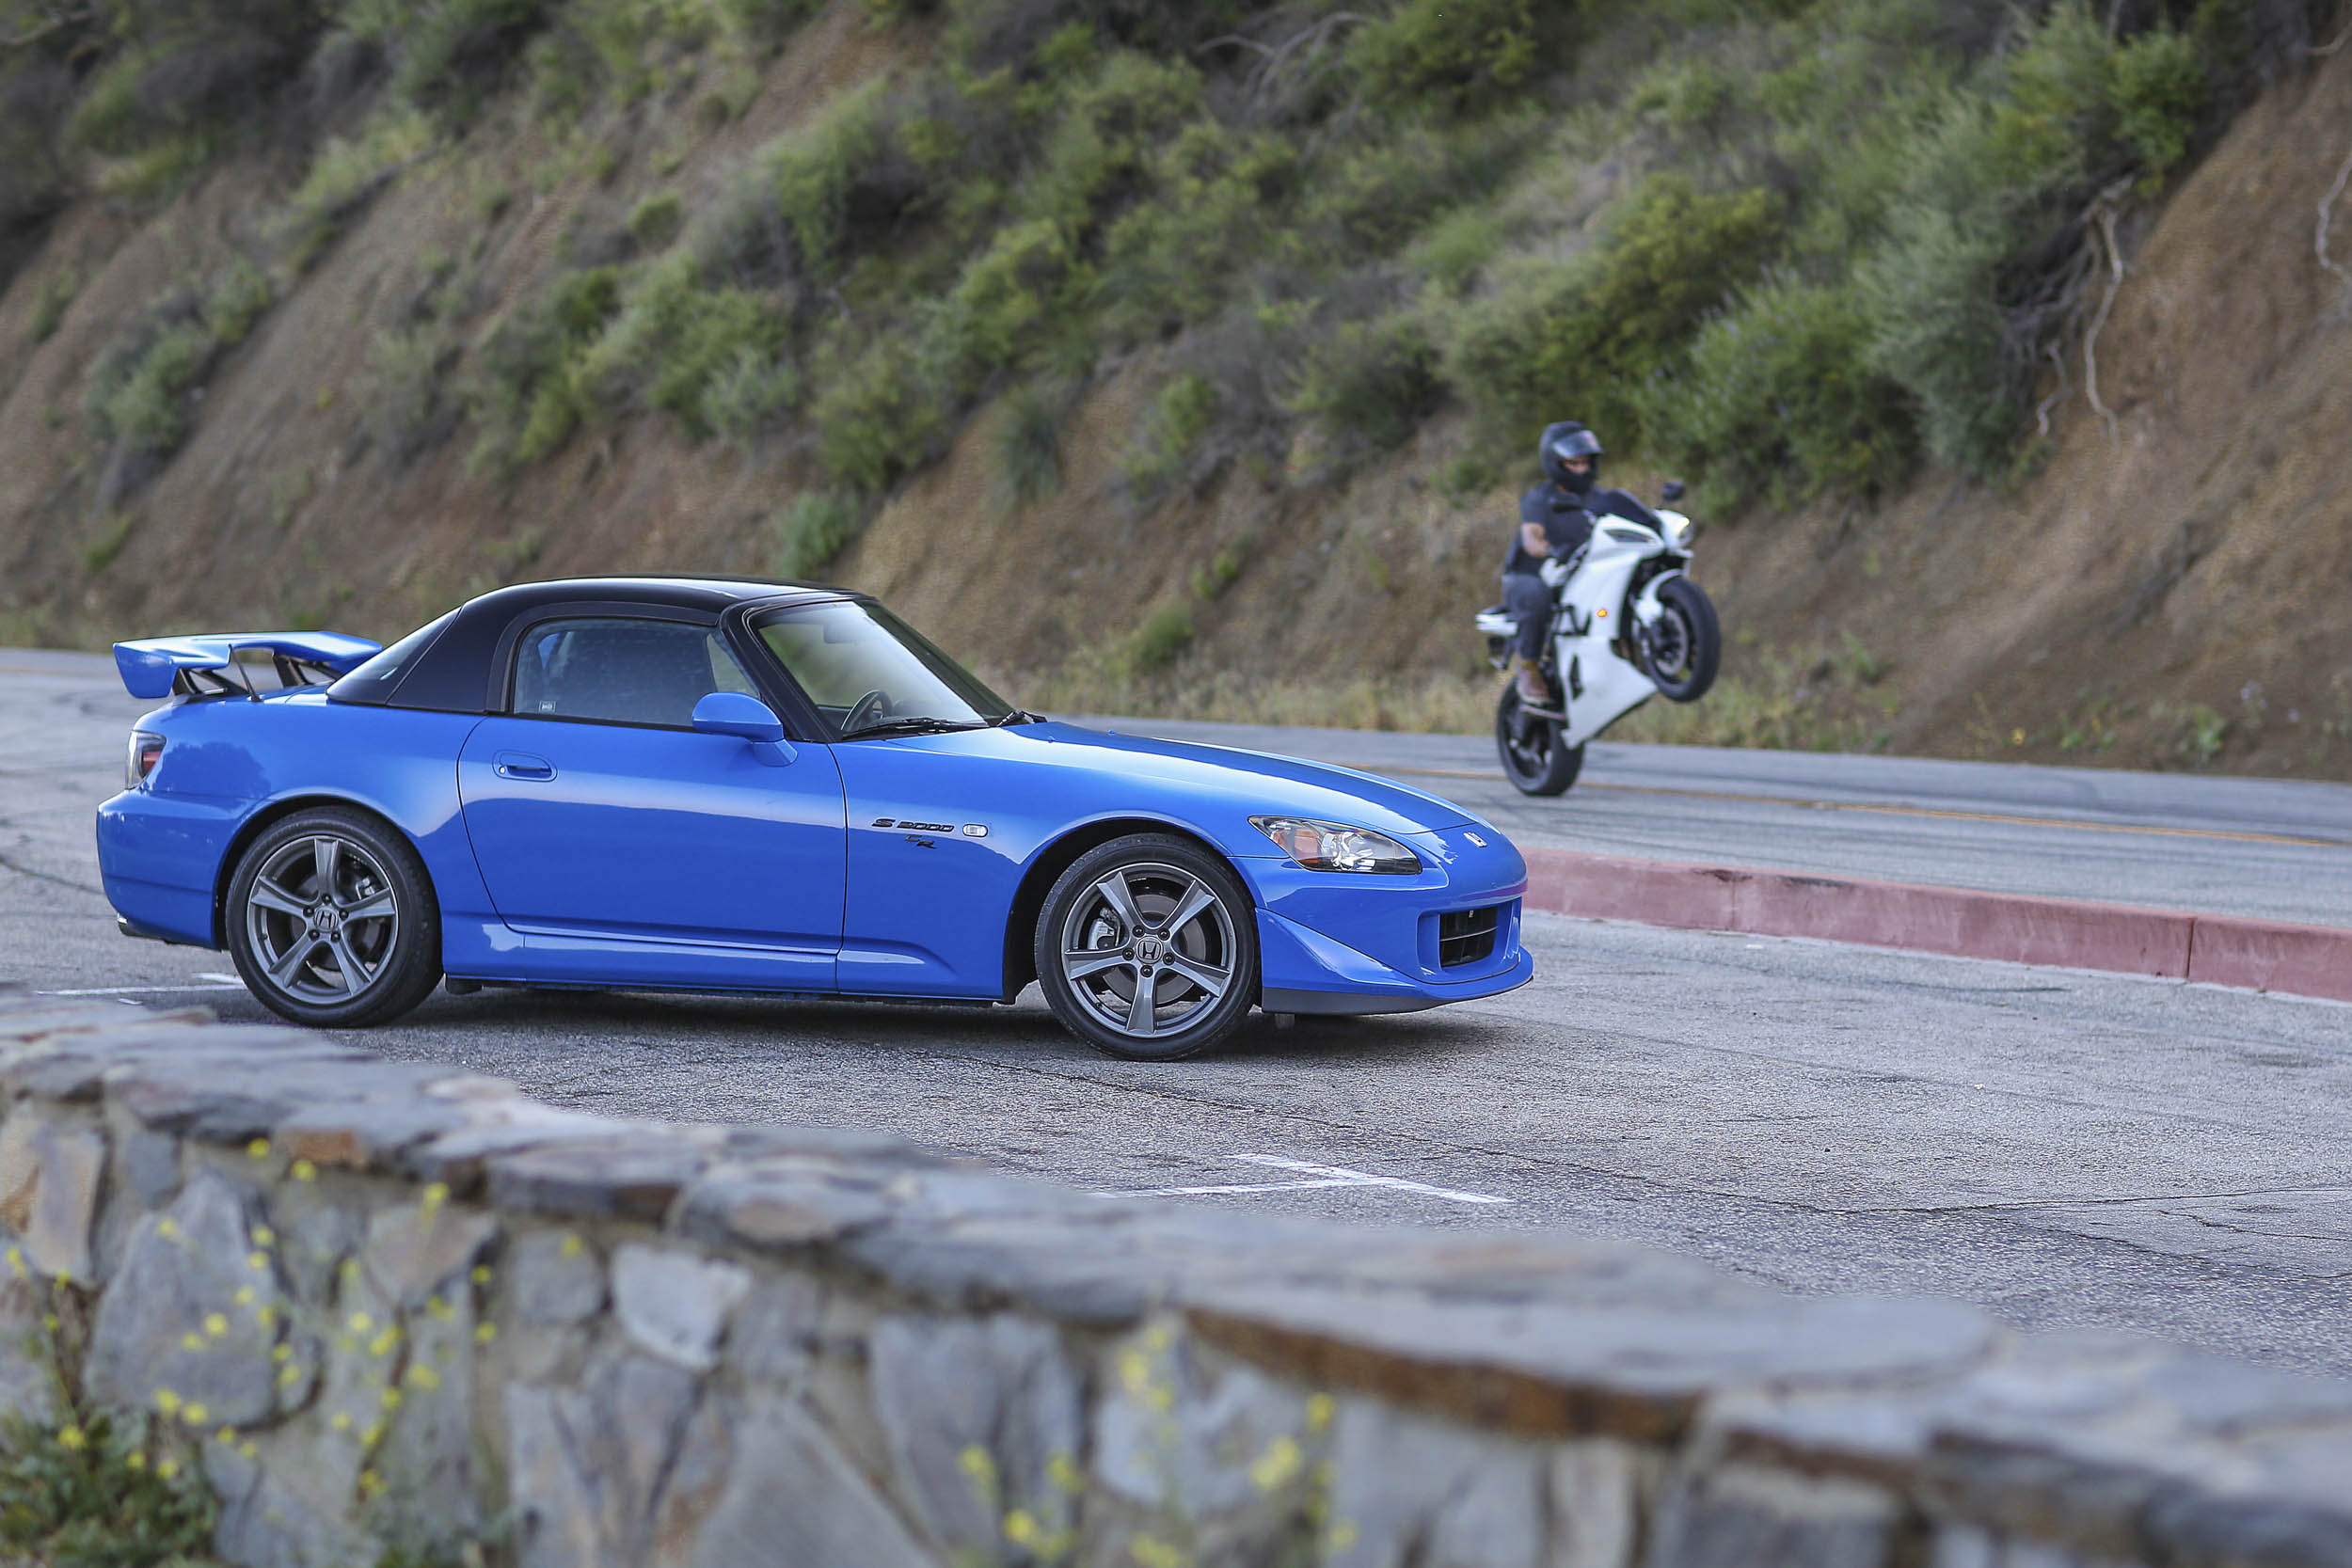 Honda S2000 club racer